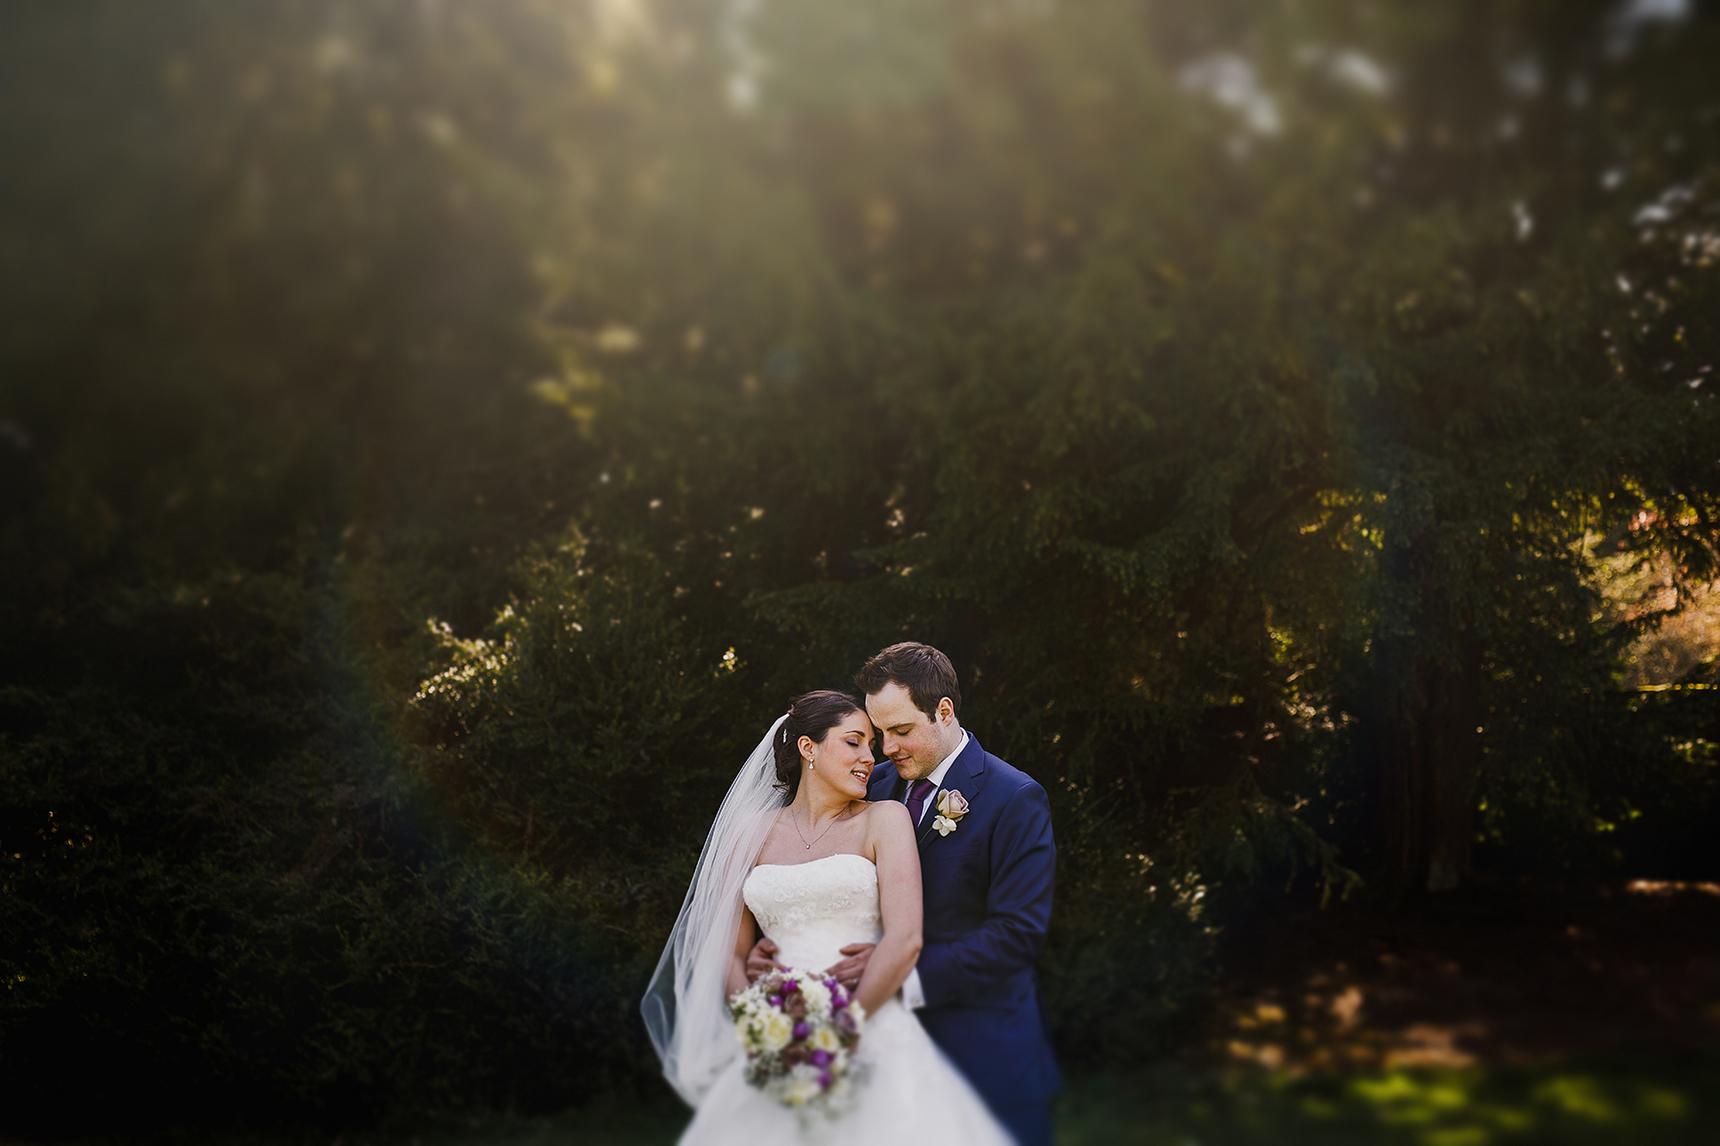 weddings swinton park